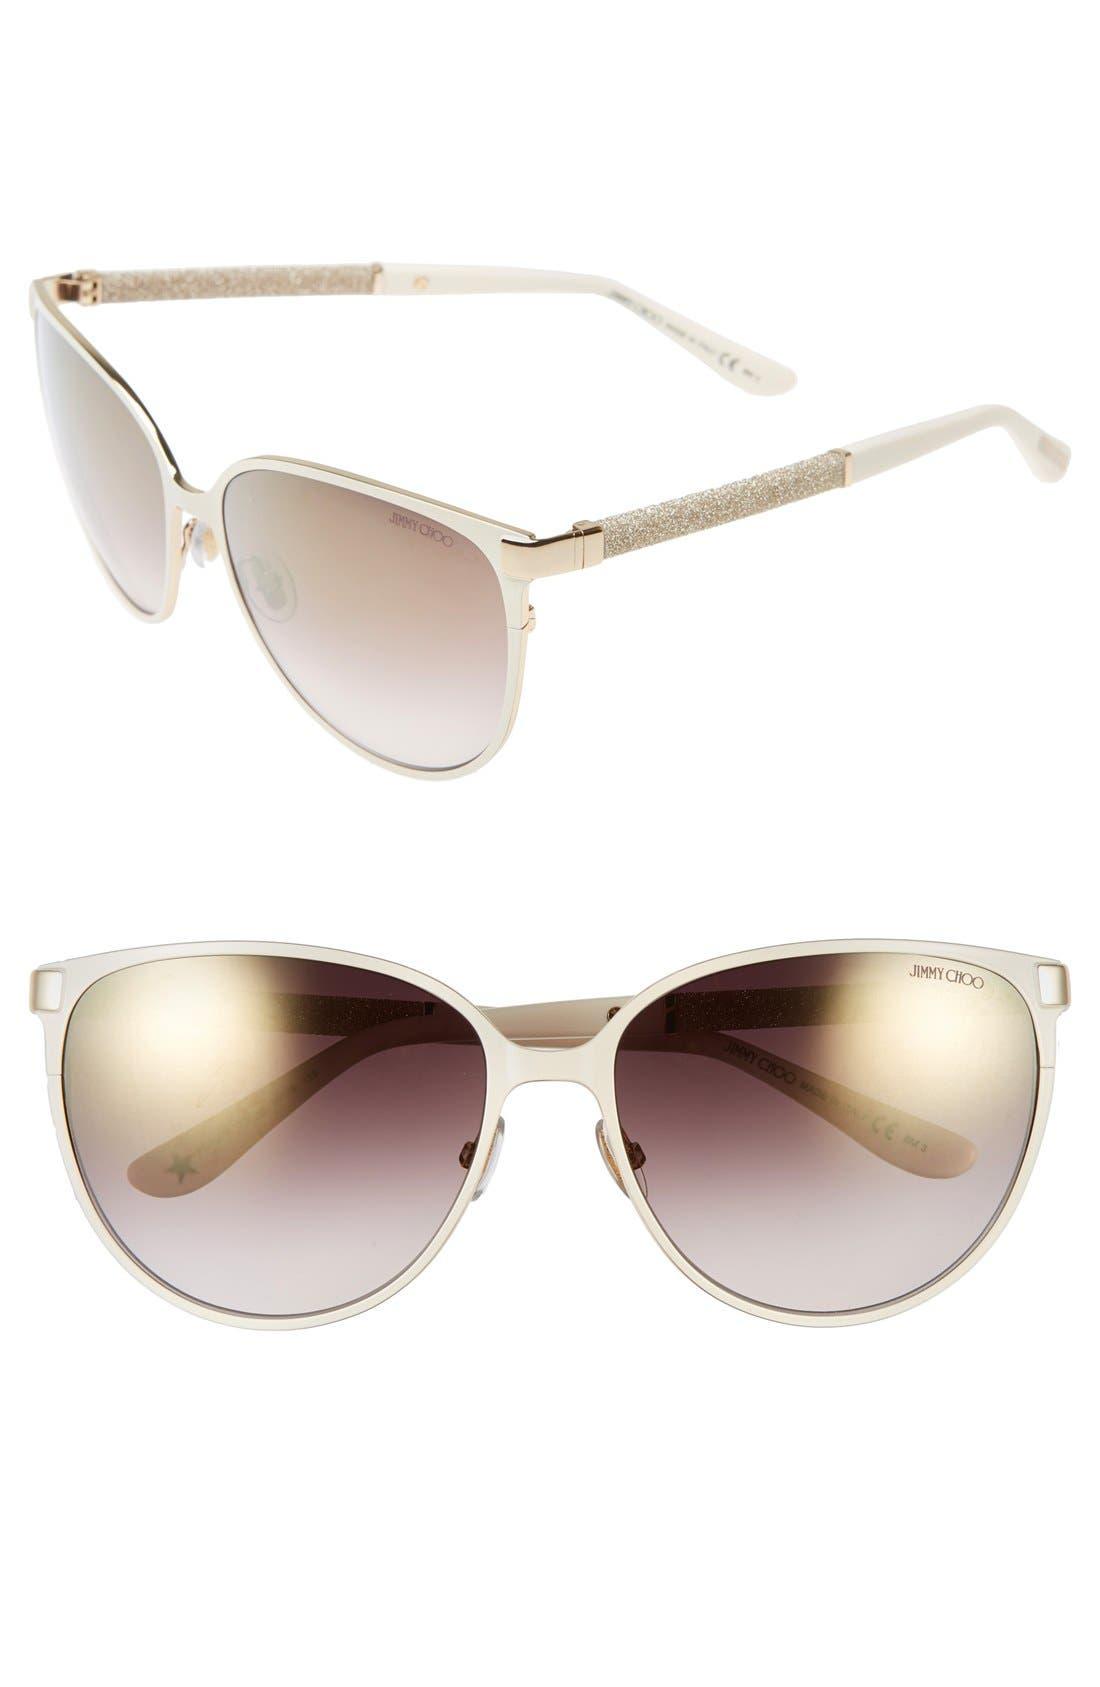 'Posies' 60mm Cat Eye Sunglasses,                             Main thumbnail 1, color,                             IVORY